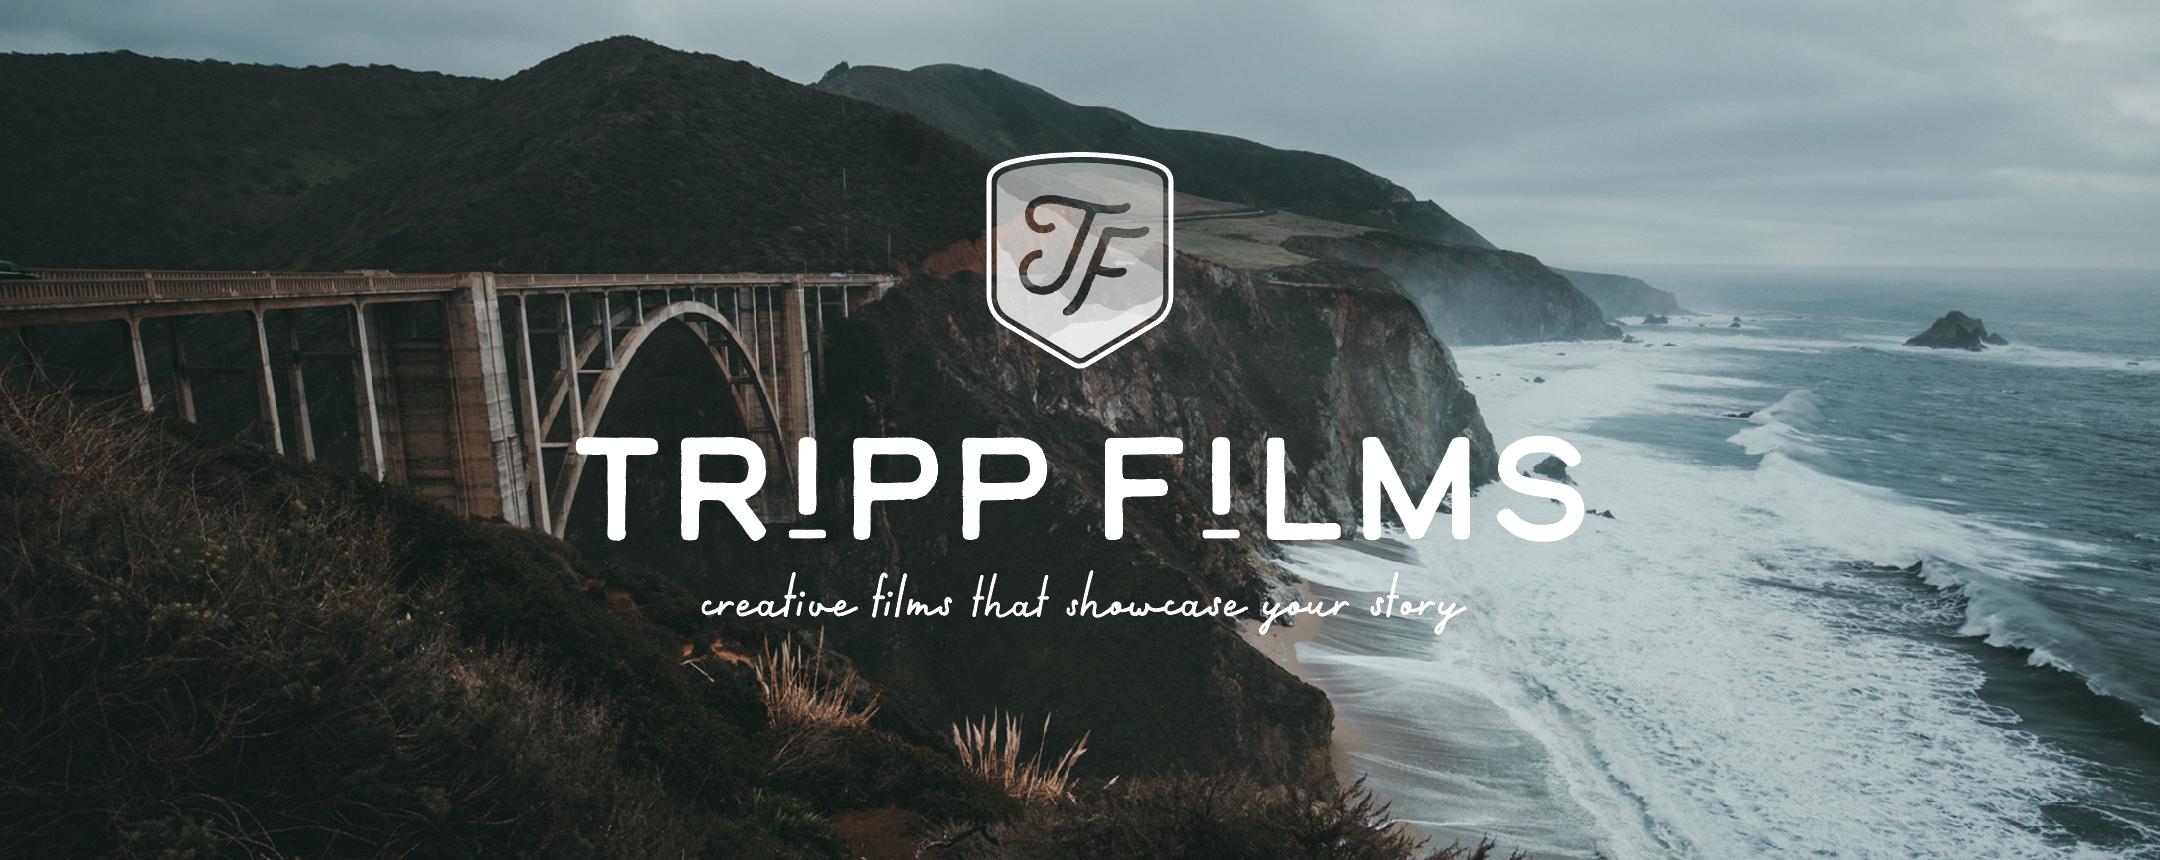 Custom Logo Design for Tripp Films by Akula Kreative | Houston, TX